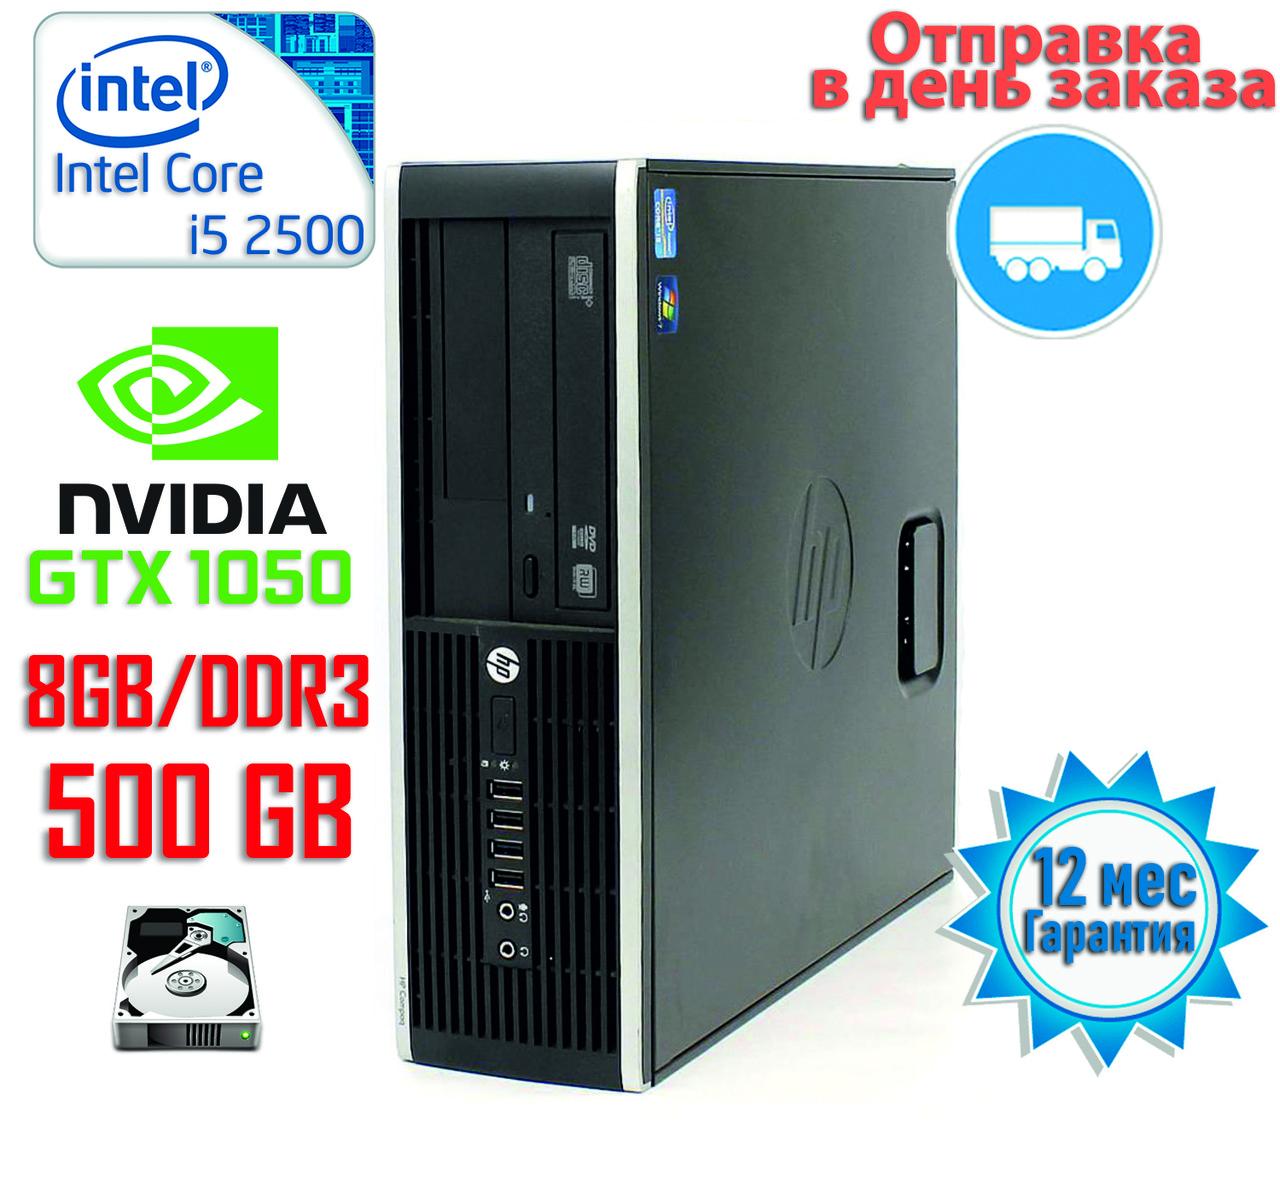 Компактный игровой компьютер Intel Core i5 4-ядра 3.3GHz/DDR3-8Gb/HDD-500gb/Nvidia GTX1050